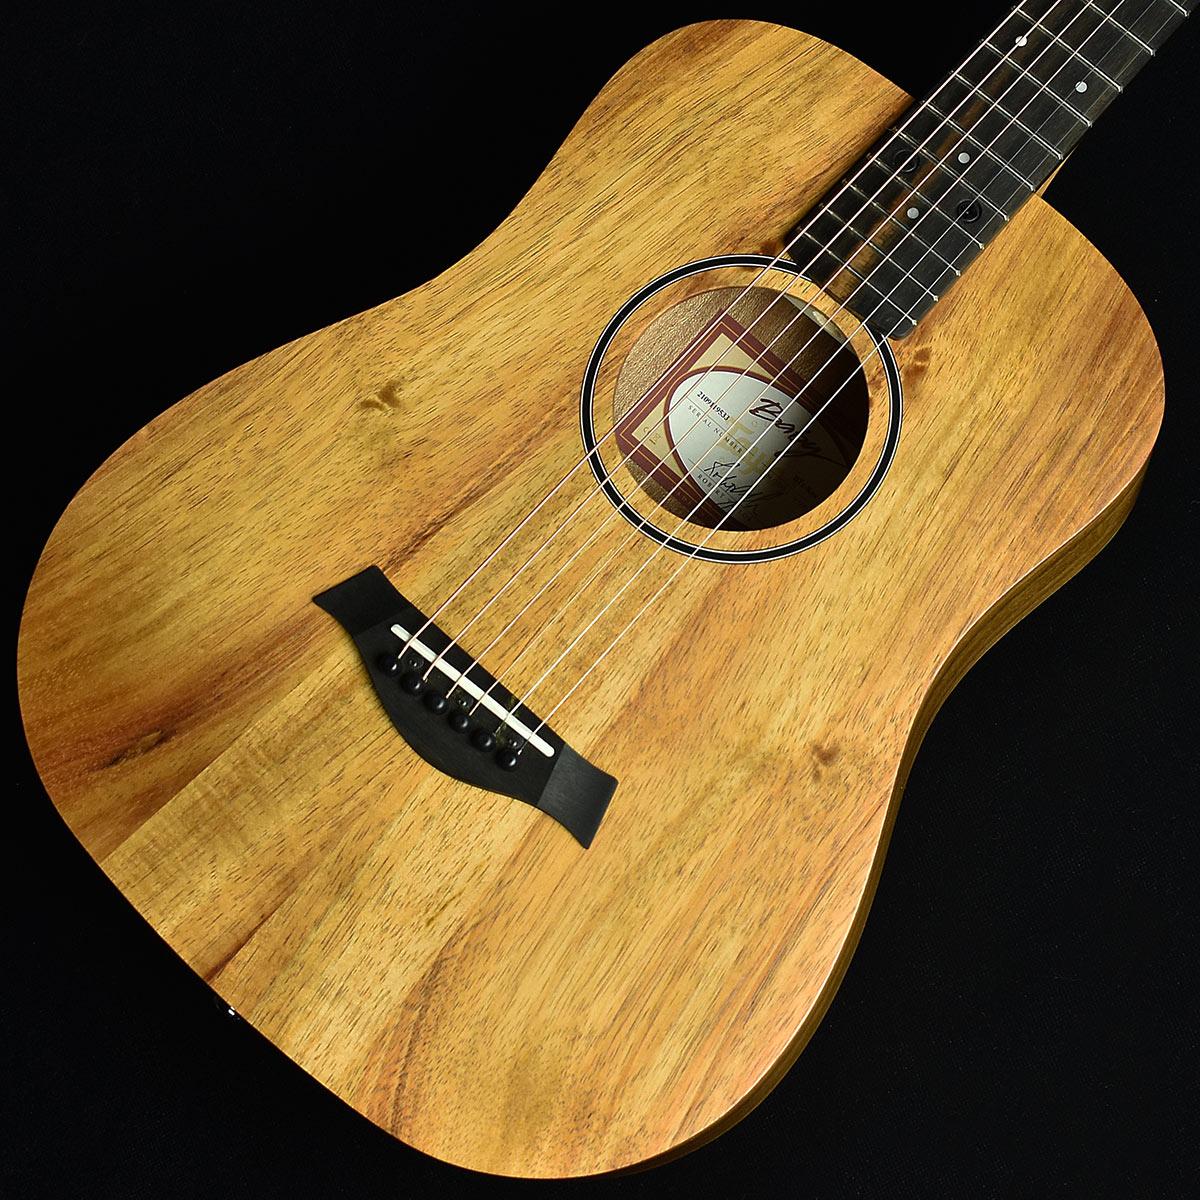 Taylor Baby Taylor-e Koa S/N:2109119533 ミニアコースティックギター【エレアコ】 【テイラー】【未展示品】